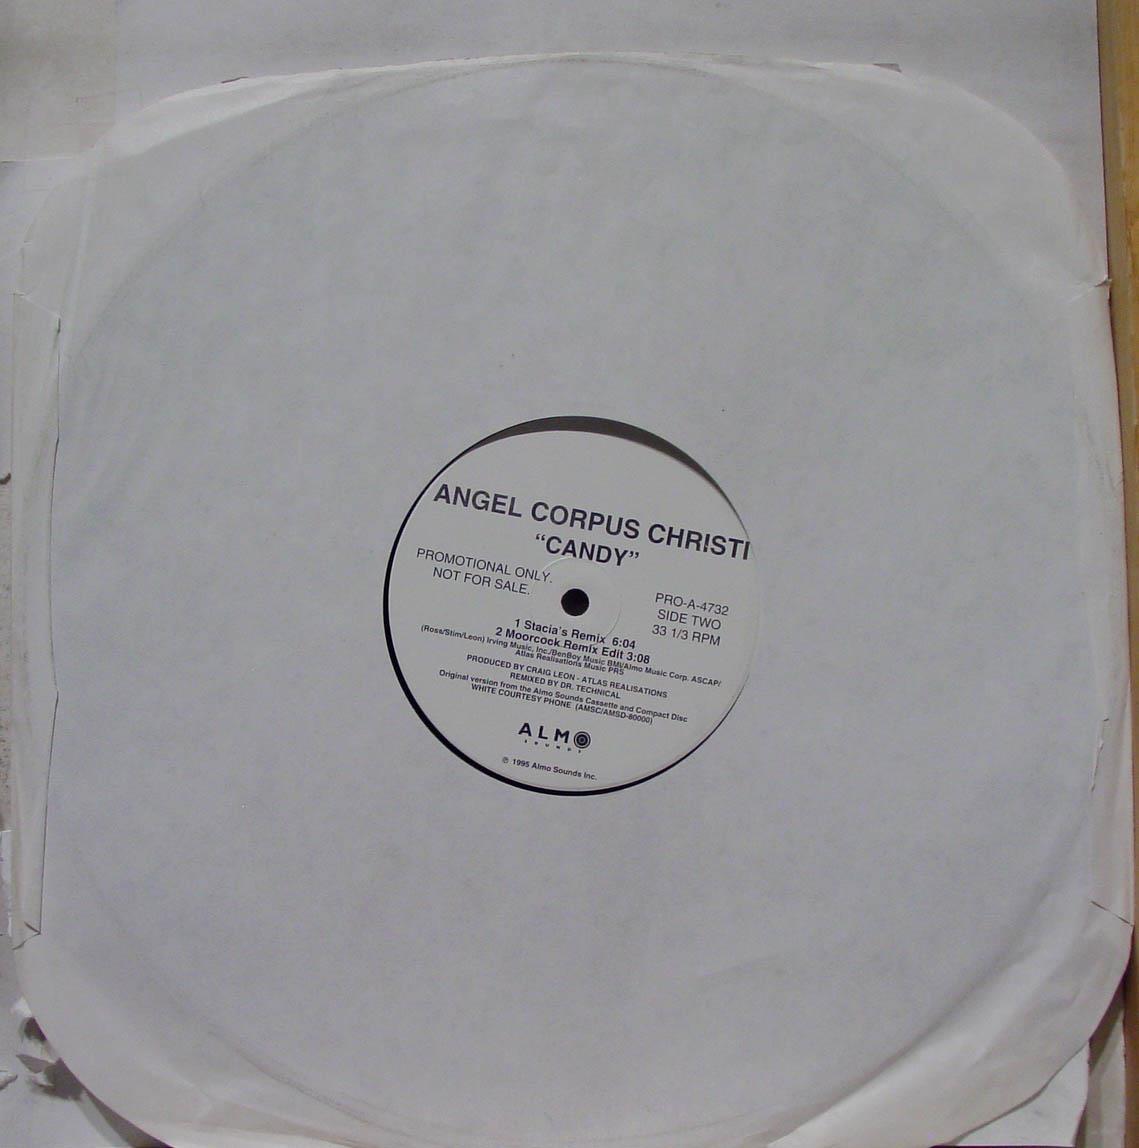 "ANGEL CORPUS CHRISTI - Angel Corpus Christi Candy 12"" Wlp Pro A 4732 Vg+ 1995 Vinyl Record (candy)"